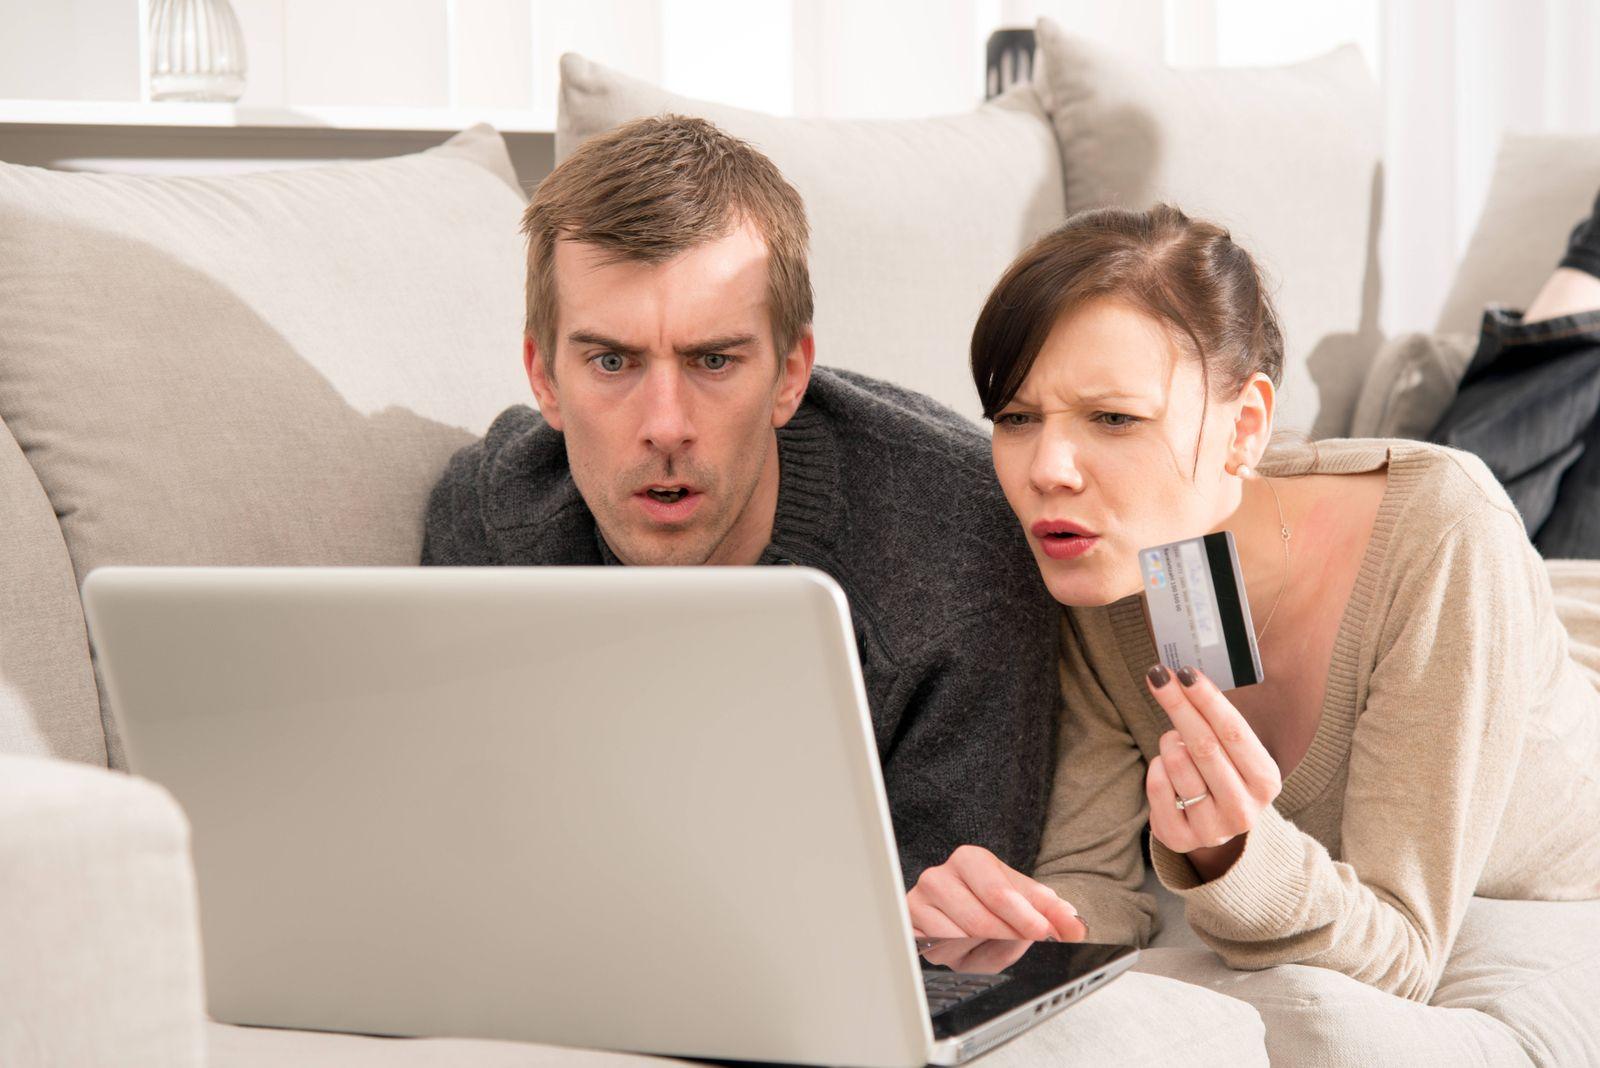 Onlineshopping junges Paar Kreditkarte Betrug Onlineshopping junges Paar Kreditkarte Betrug